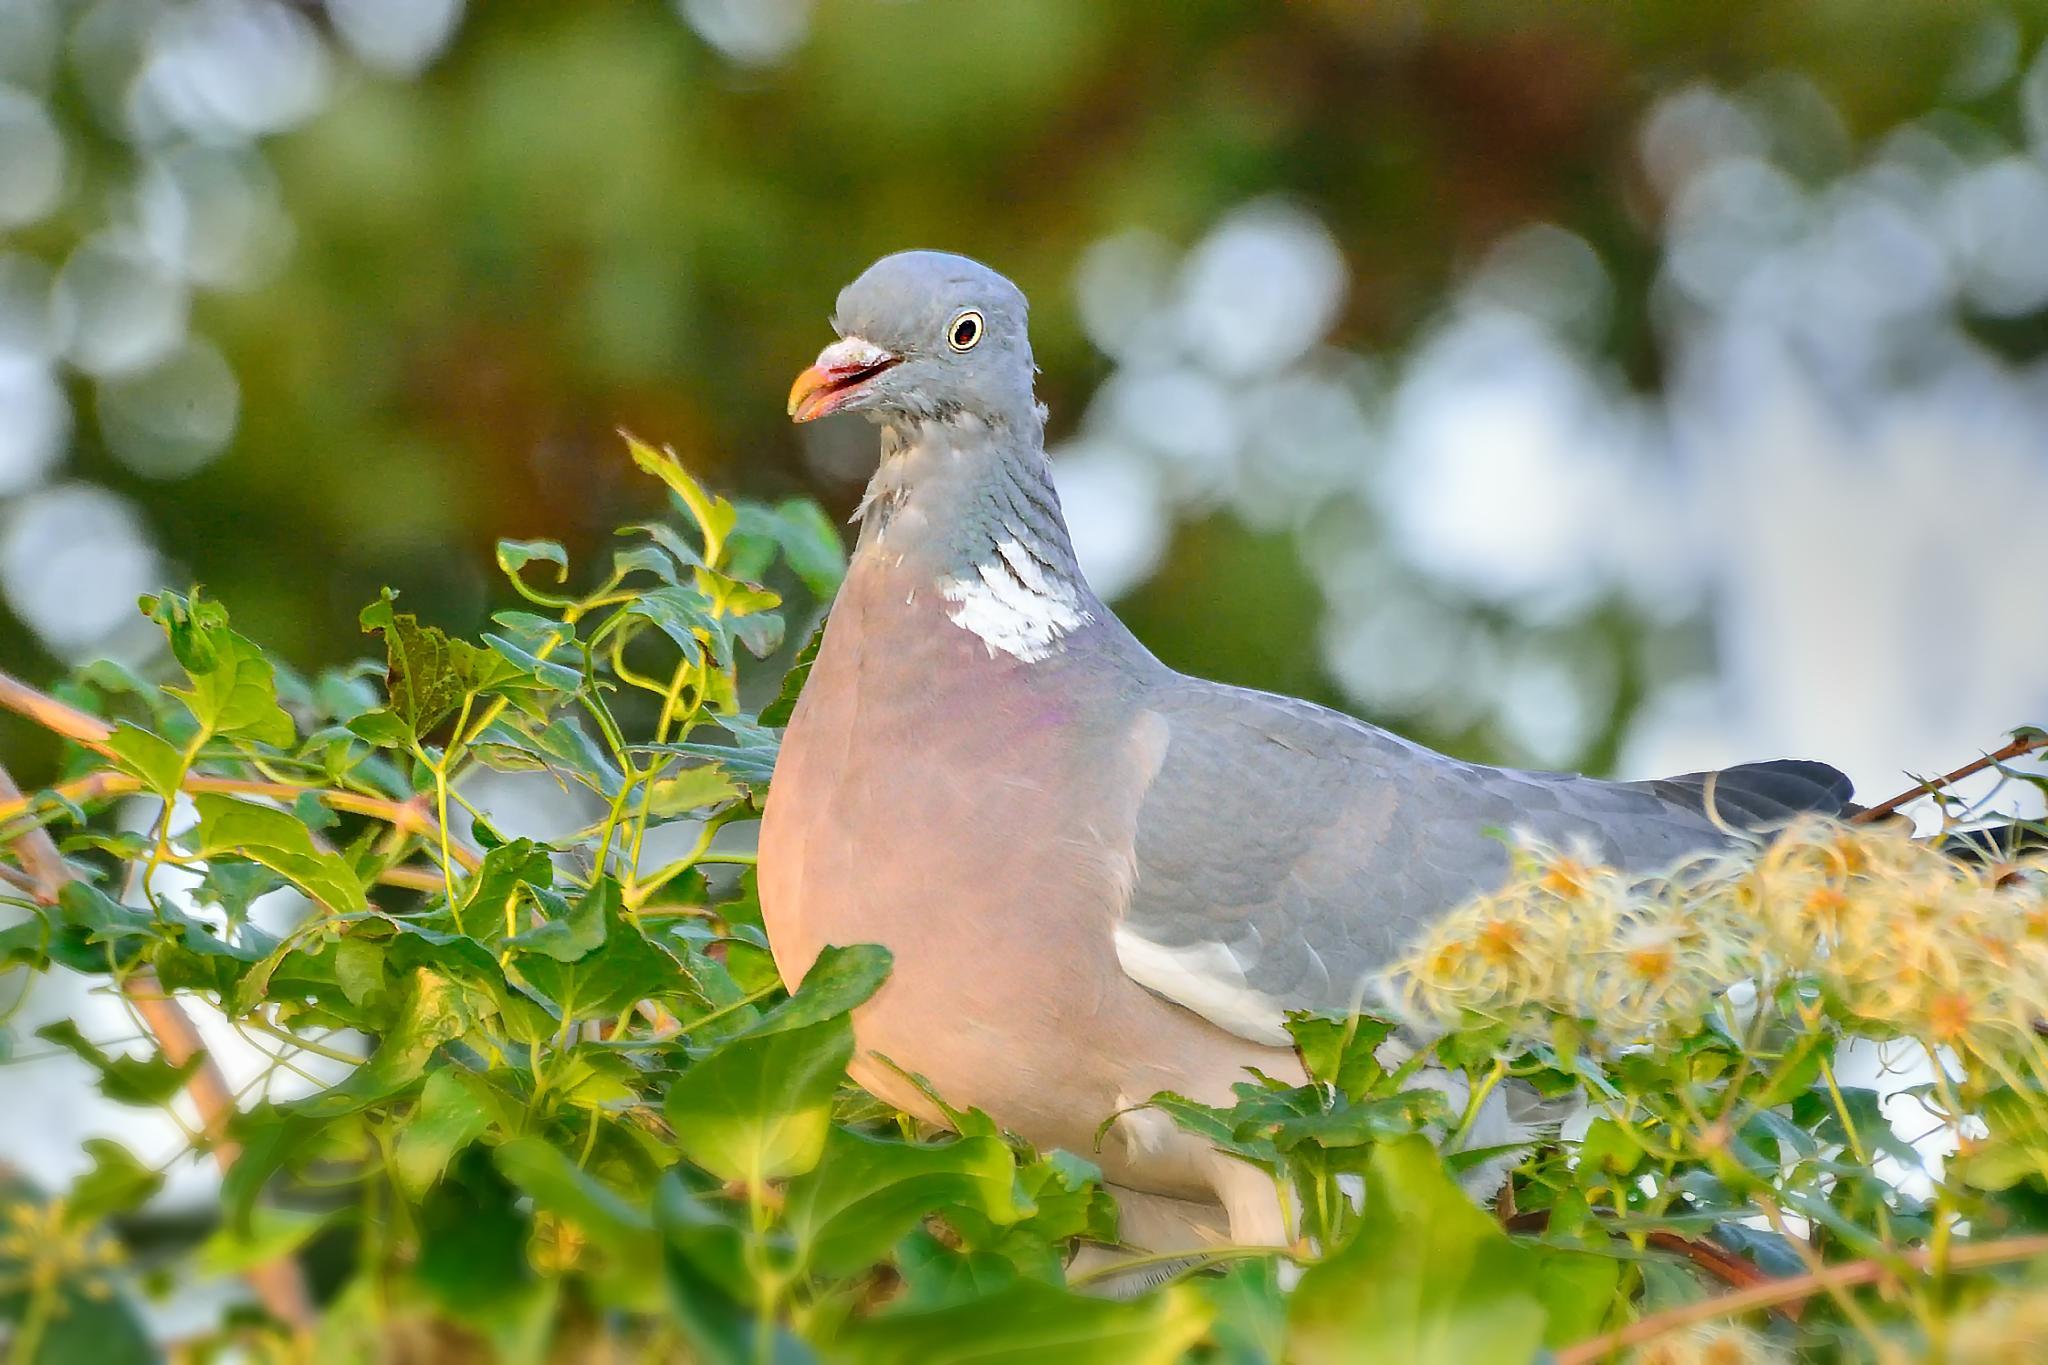 Pigeon by Akanjee Nizam